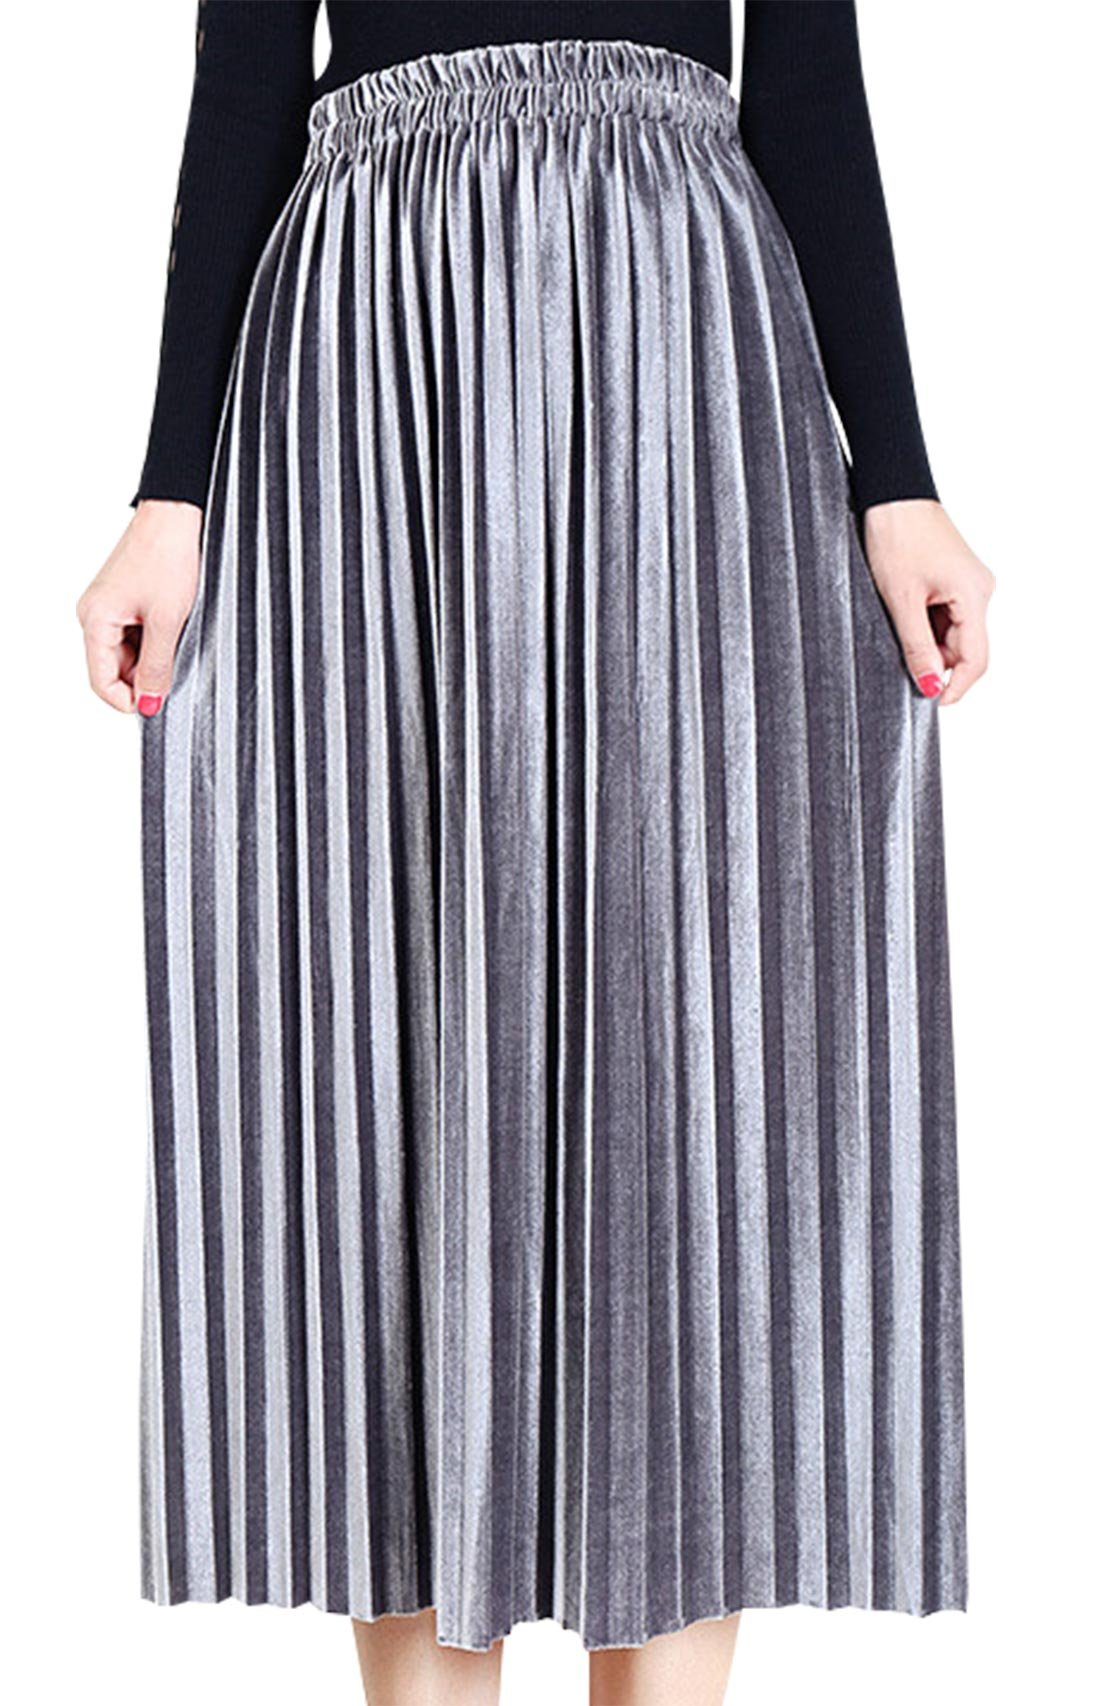 Aivtalk Women Metallic Skirt Peasant Midi Long Elastic Waist Glittery Casual Skirts Size M Gray